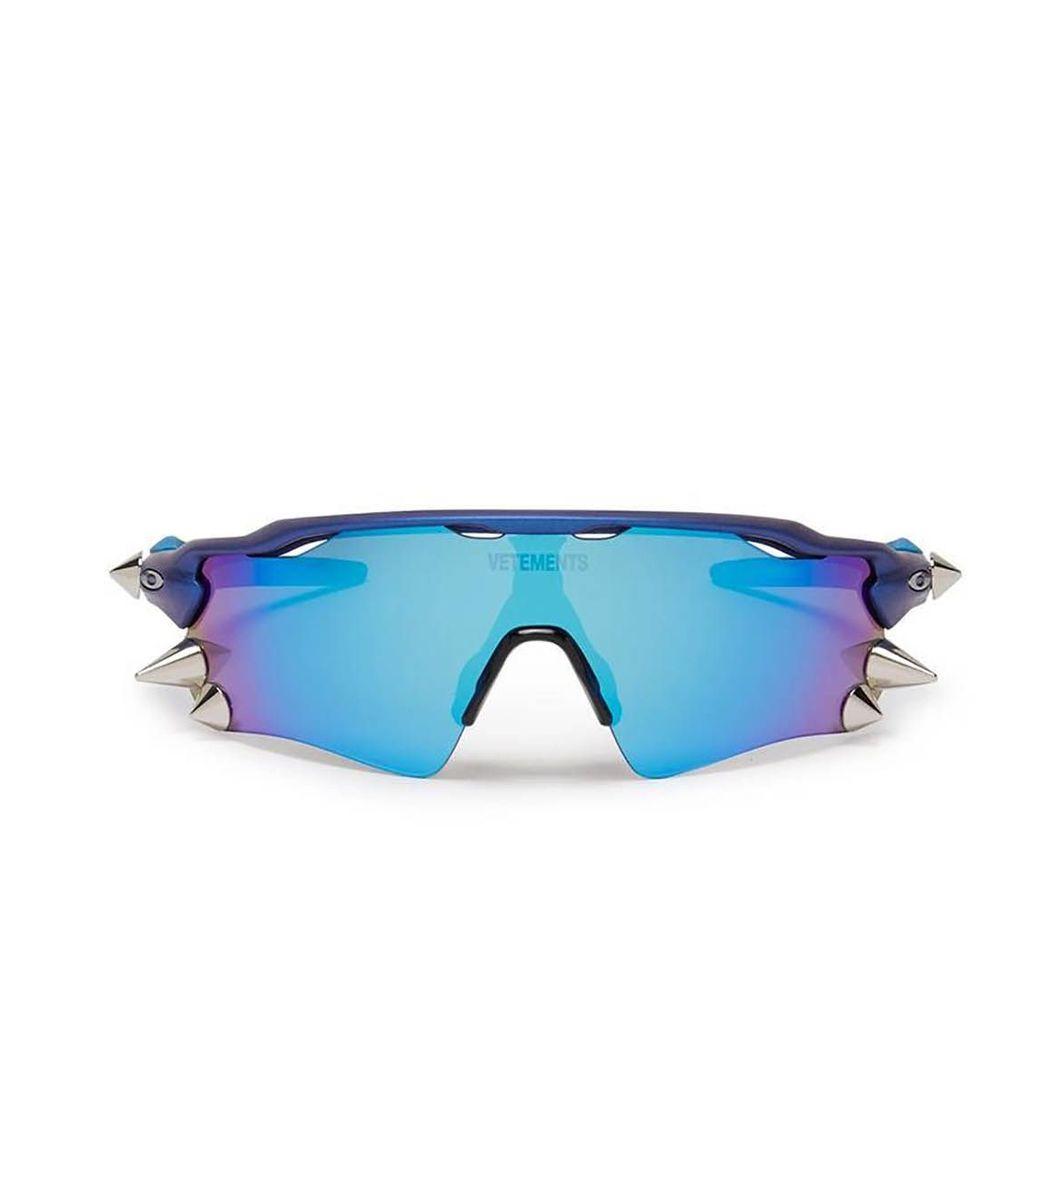 Vetements Sunglasses Vetements x Oakley Spike 200 Blue Sunglasses